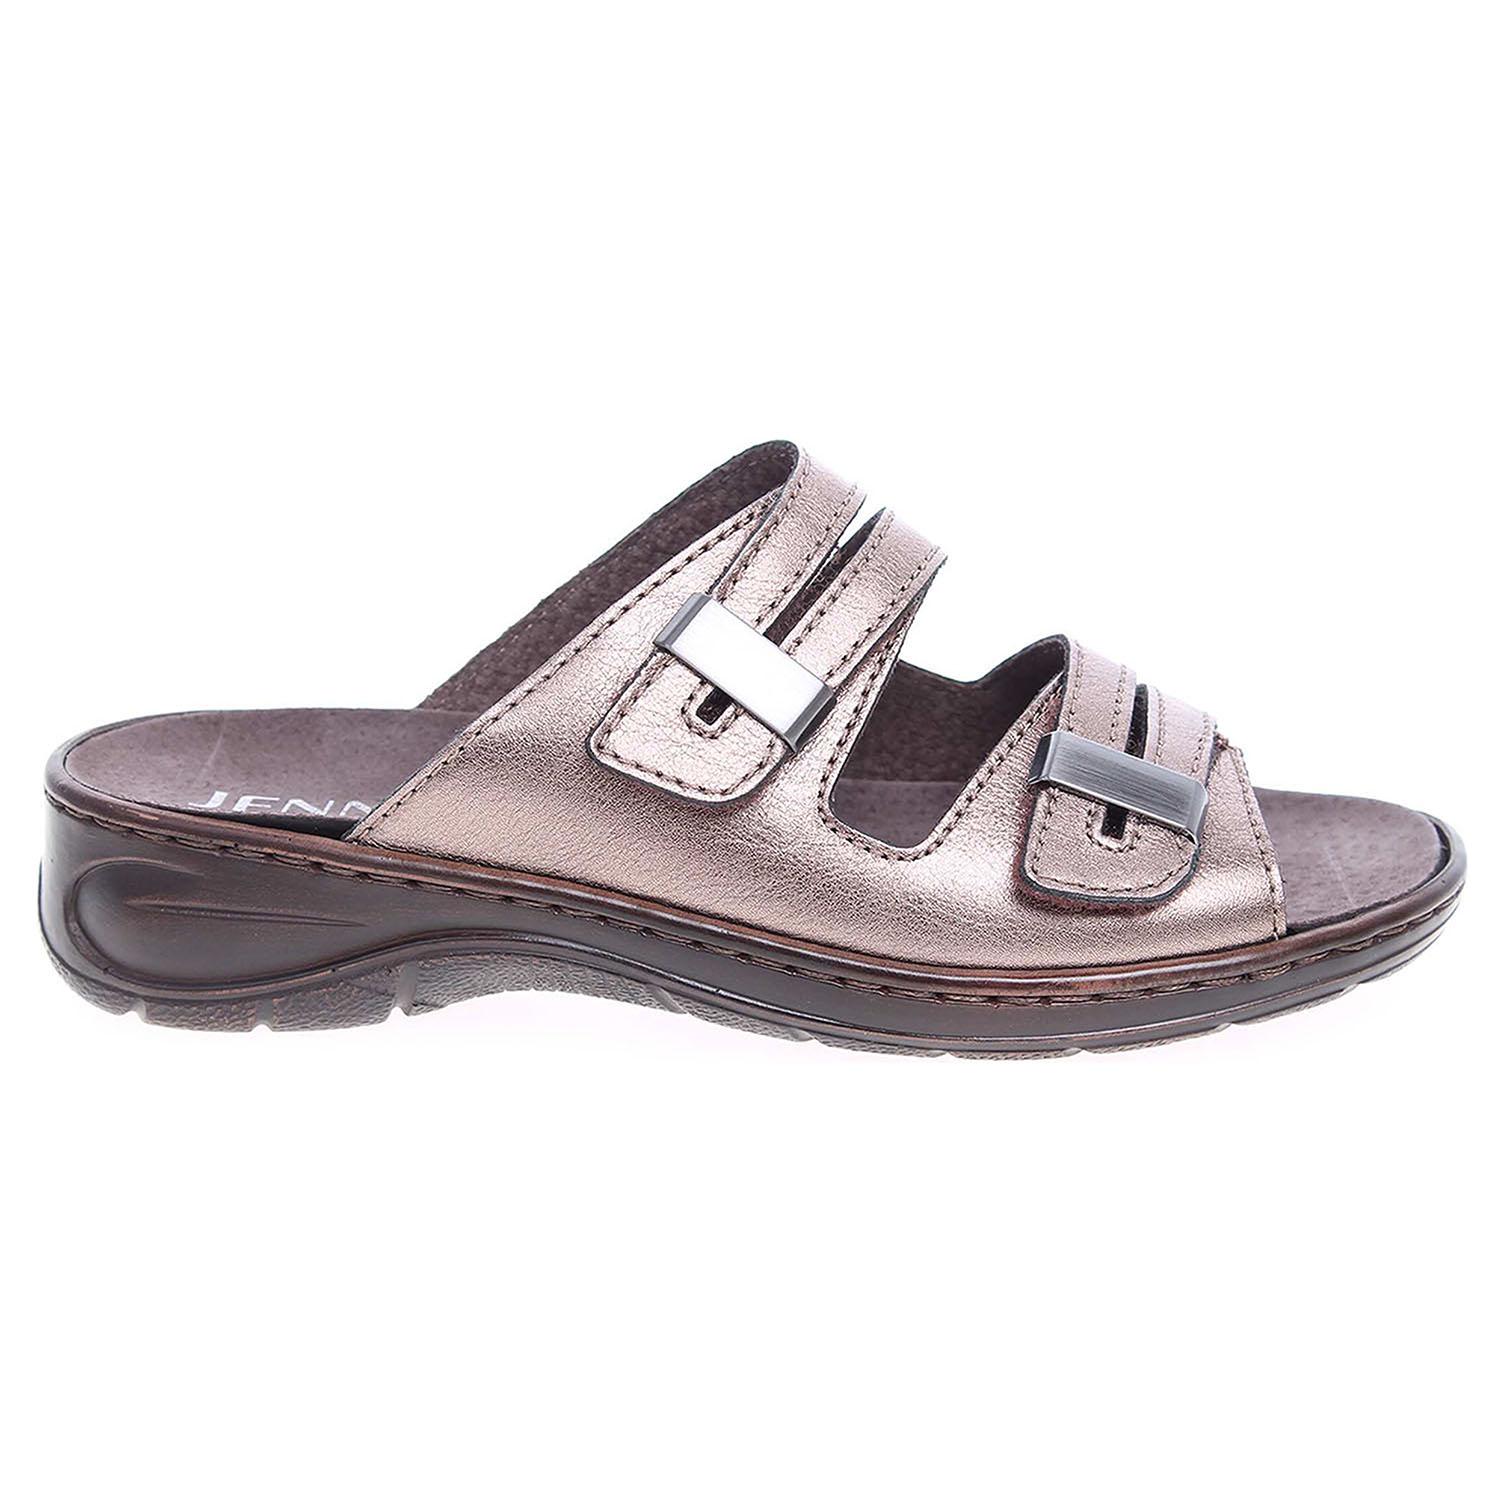 Ecco Ara dámské pantofle 56554-10 titan 23600779